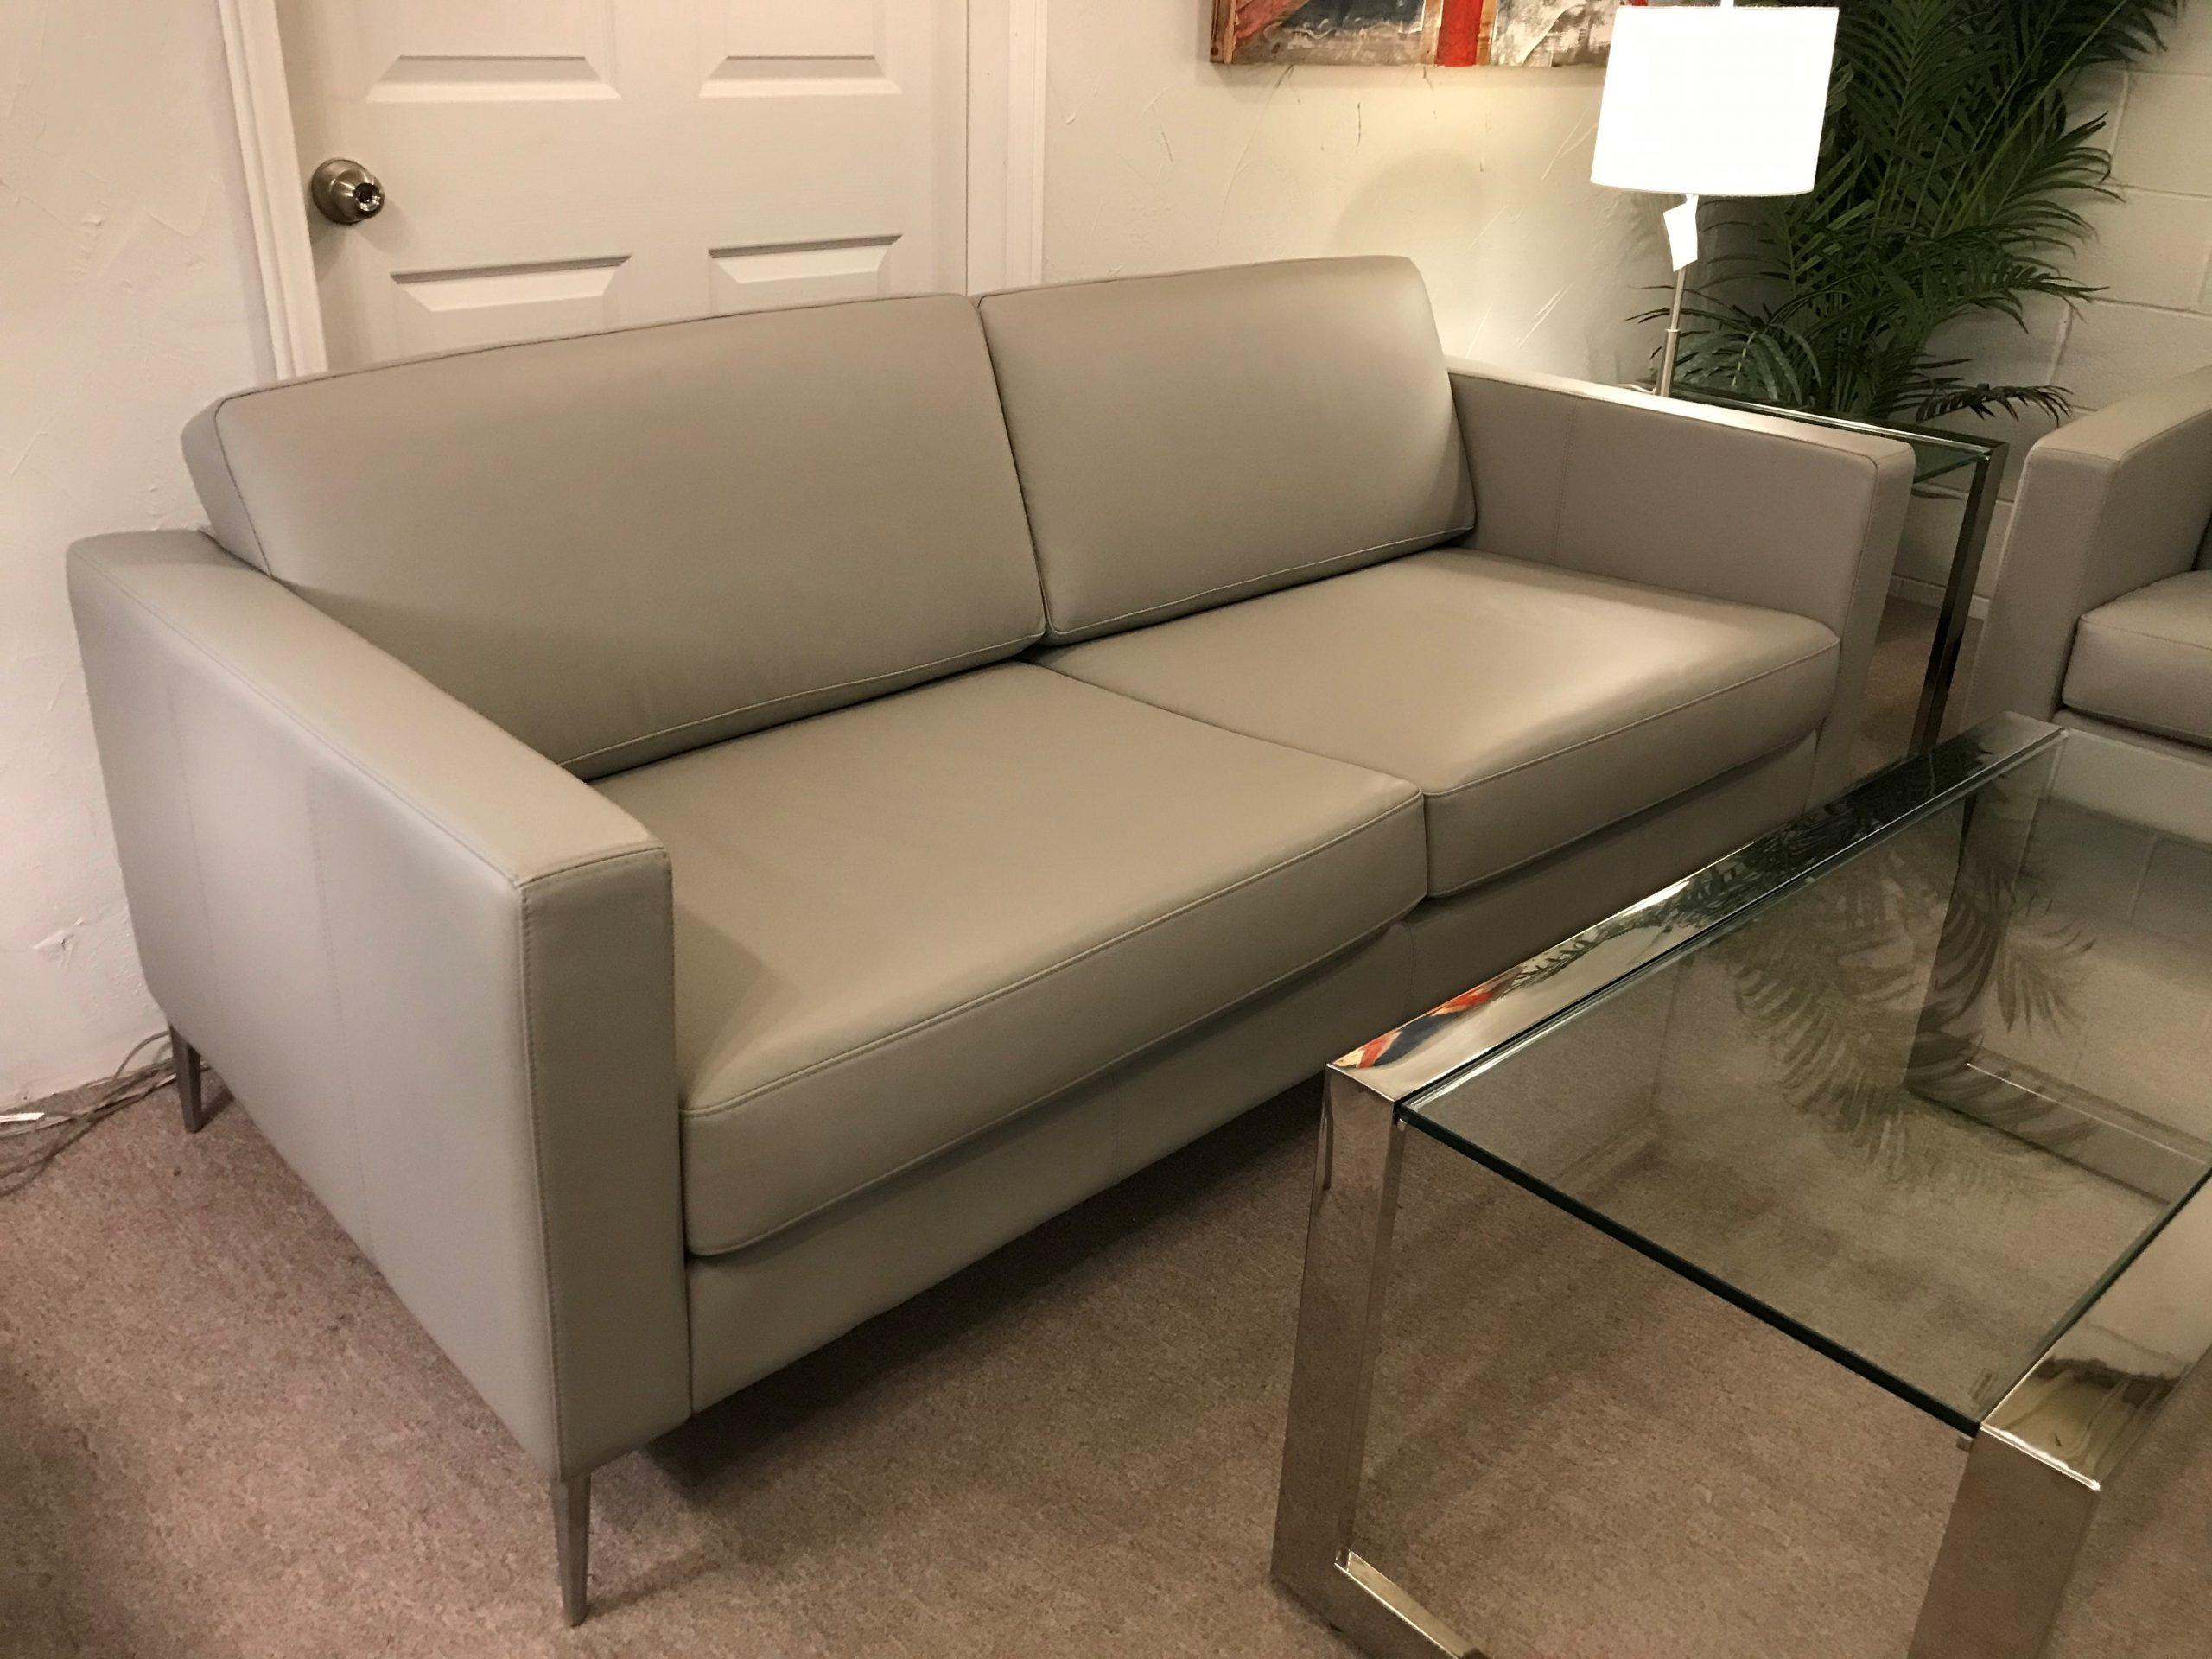 kensington lcraft leather sofa